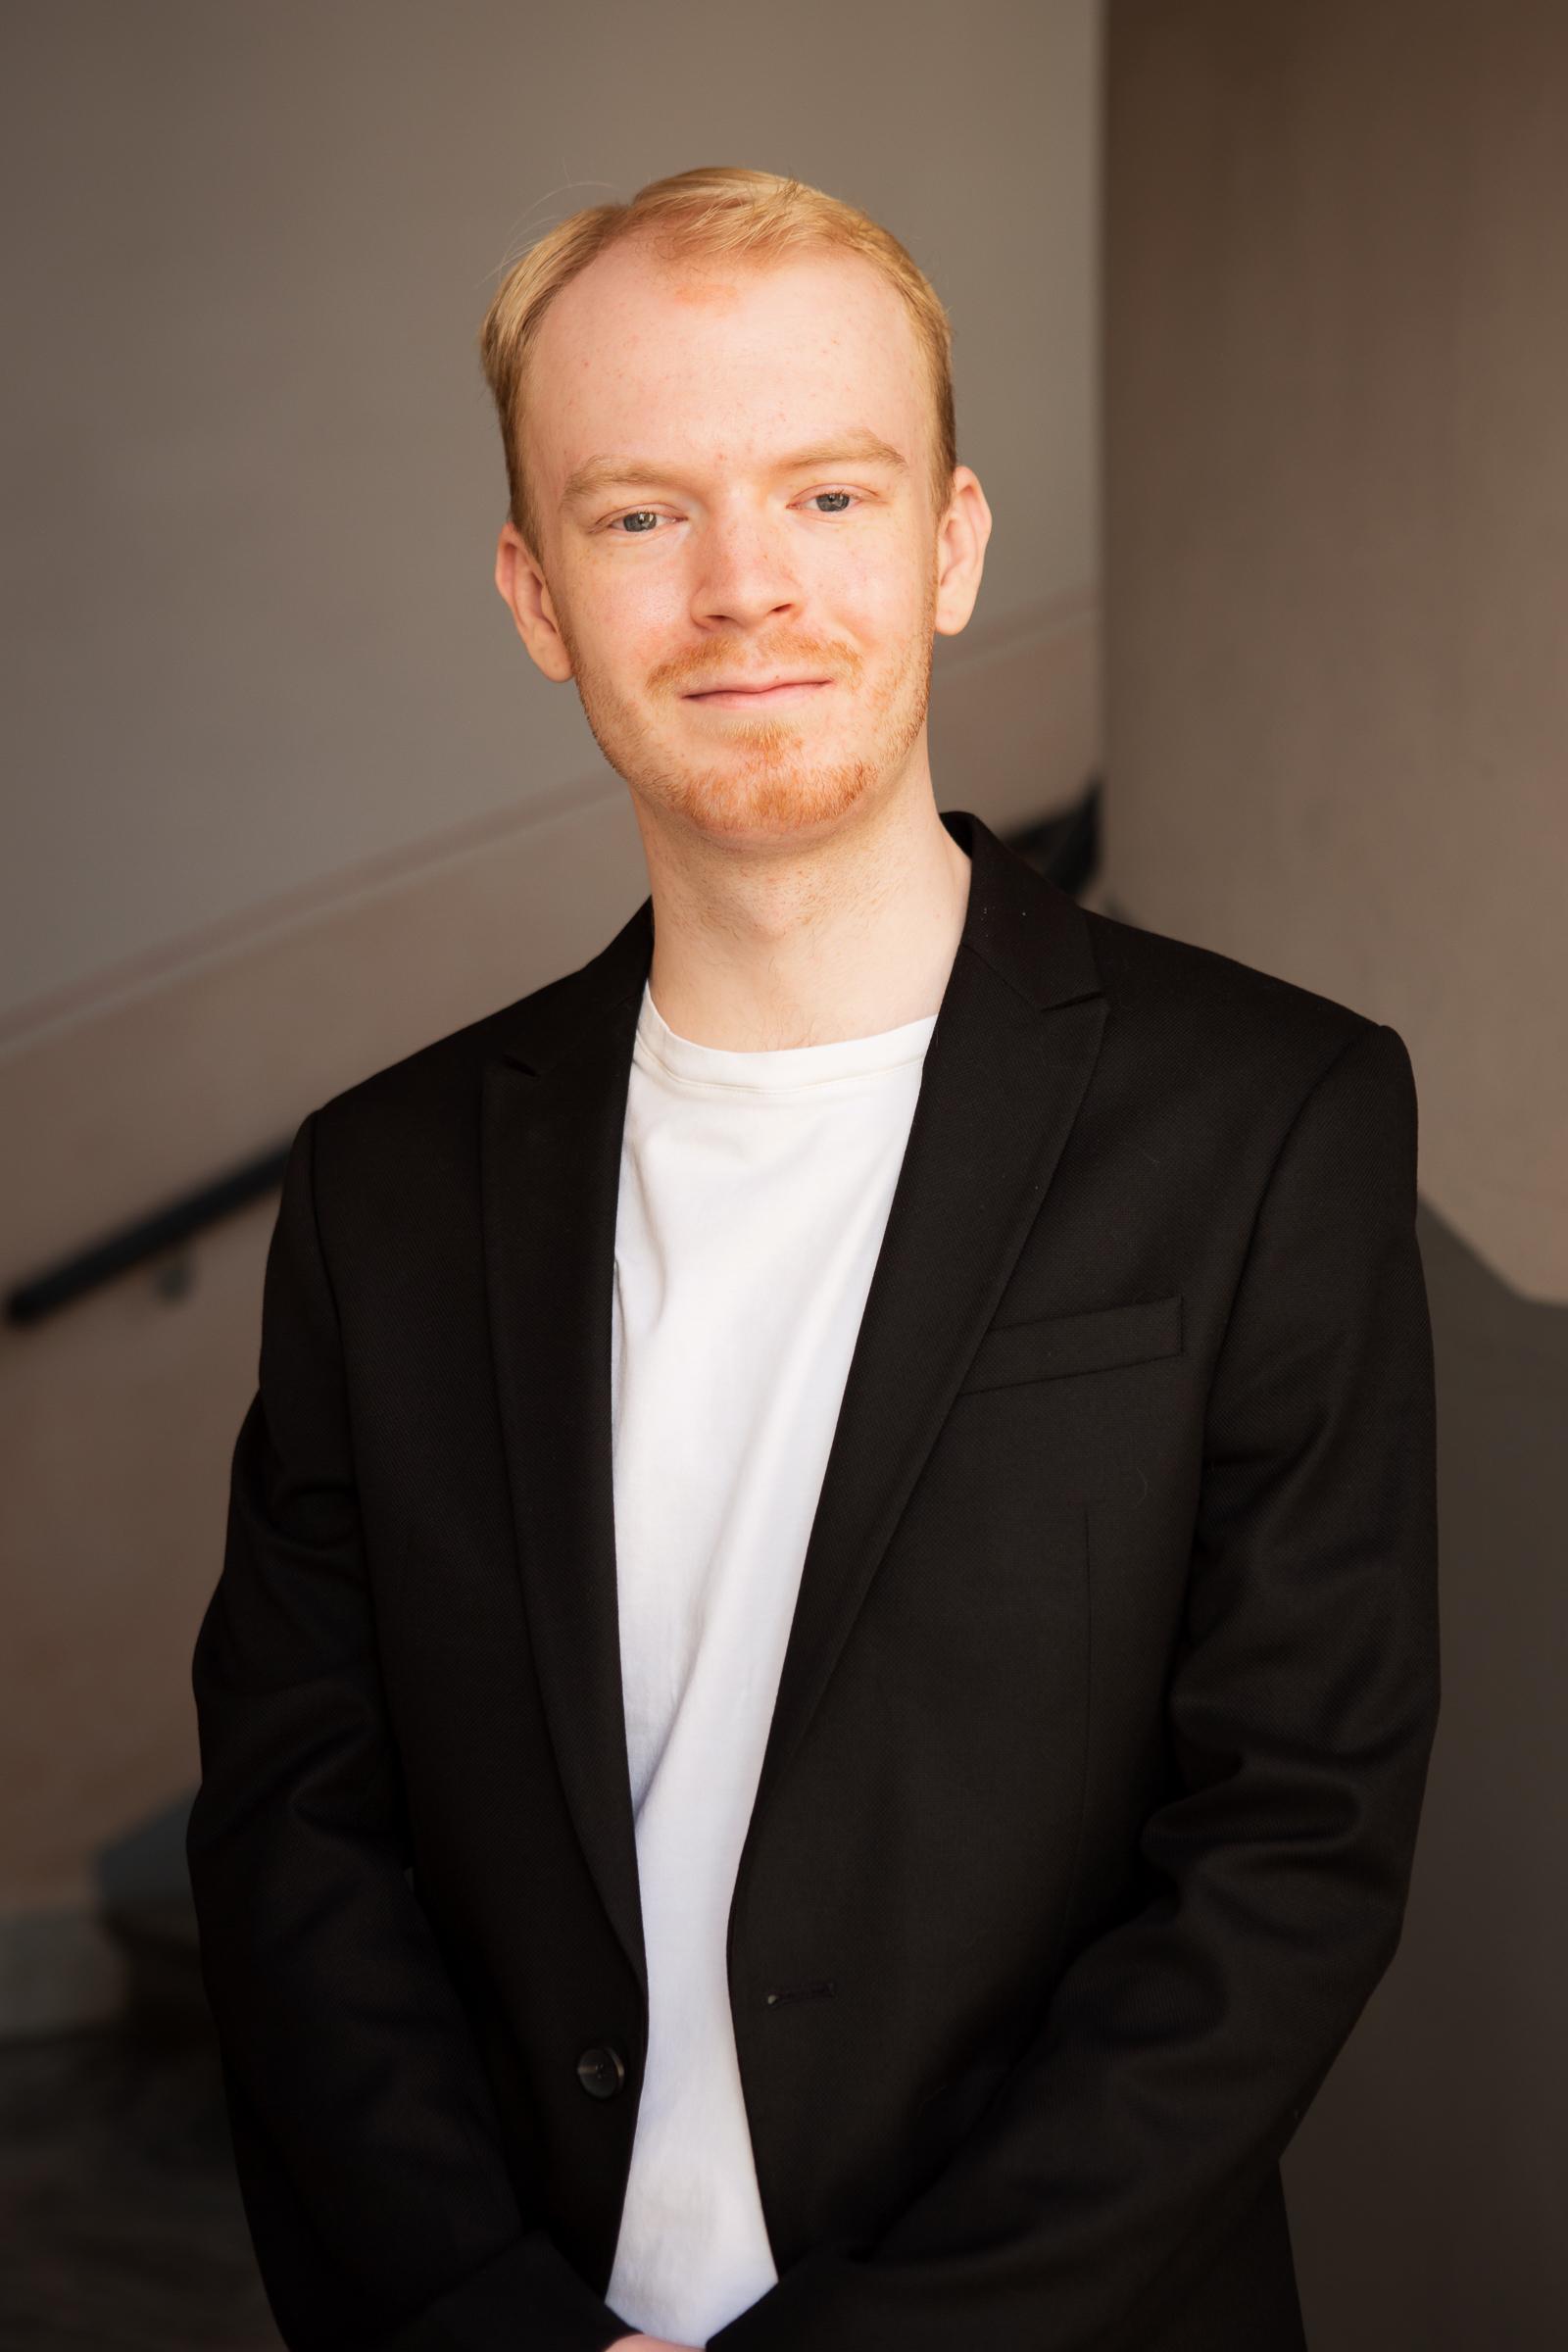 Vincent Lundborg